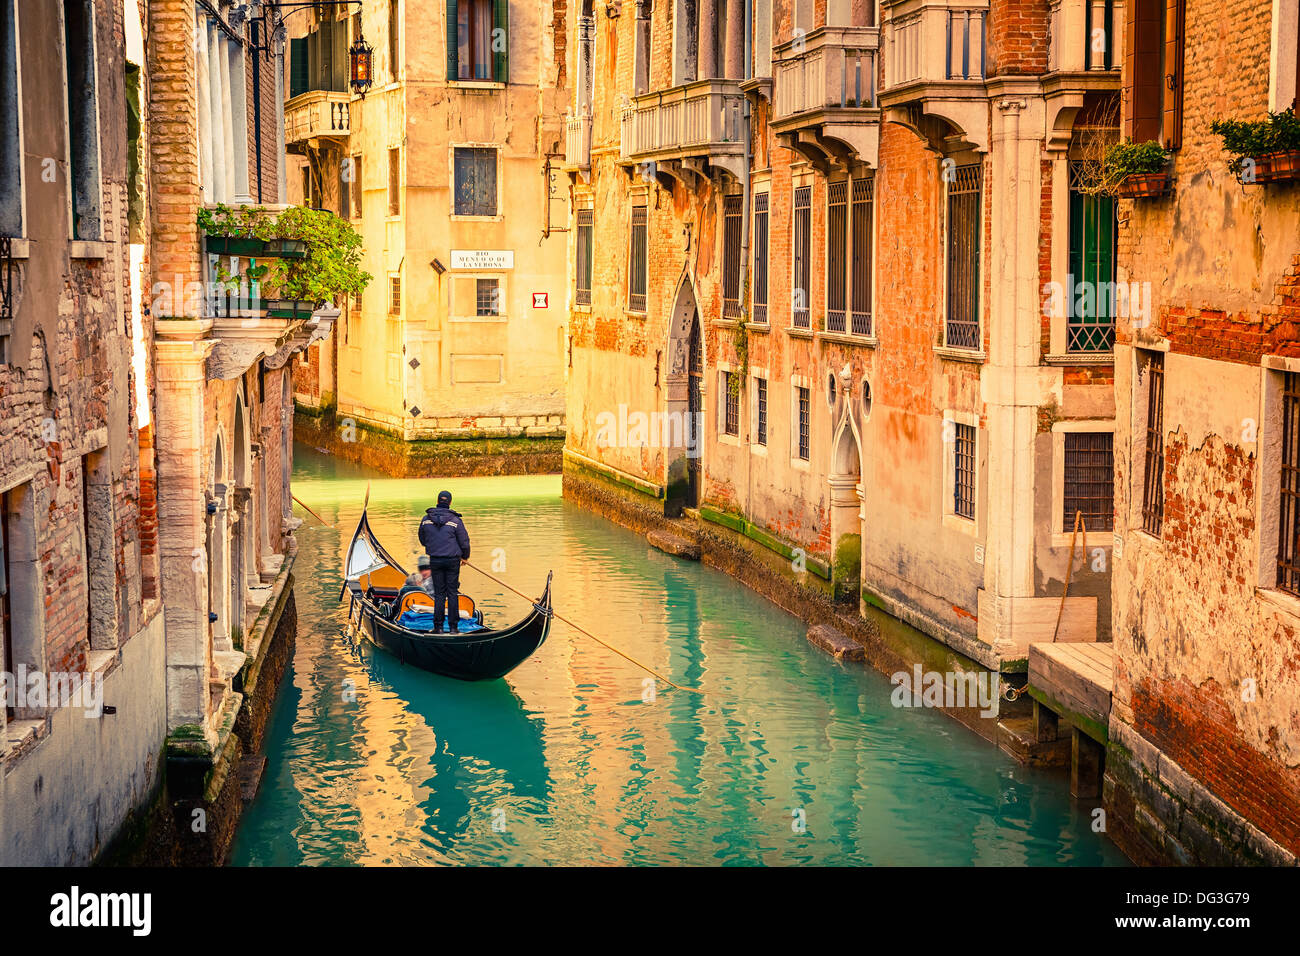 Canal en Venecia Imagen De Stock